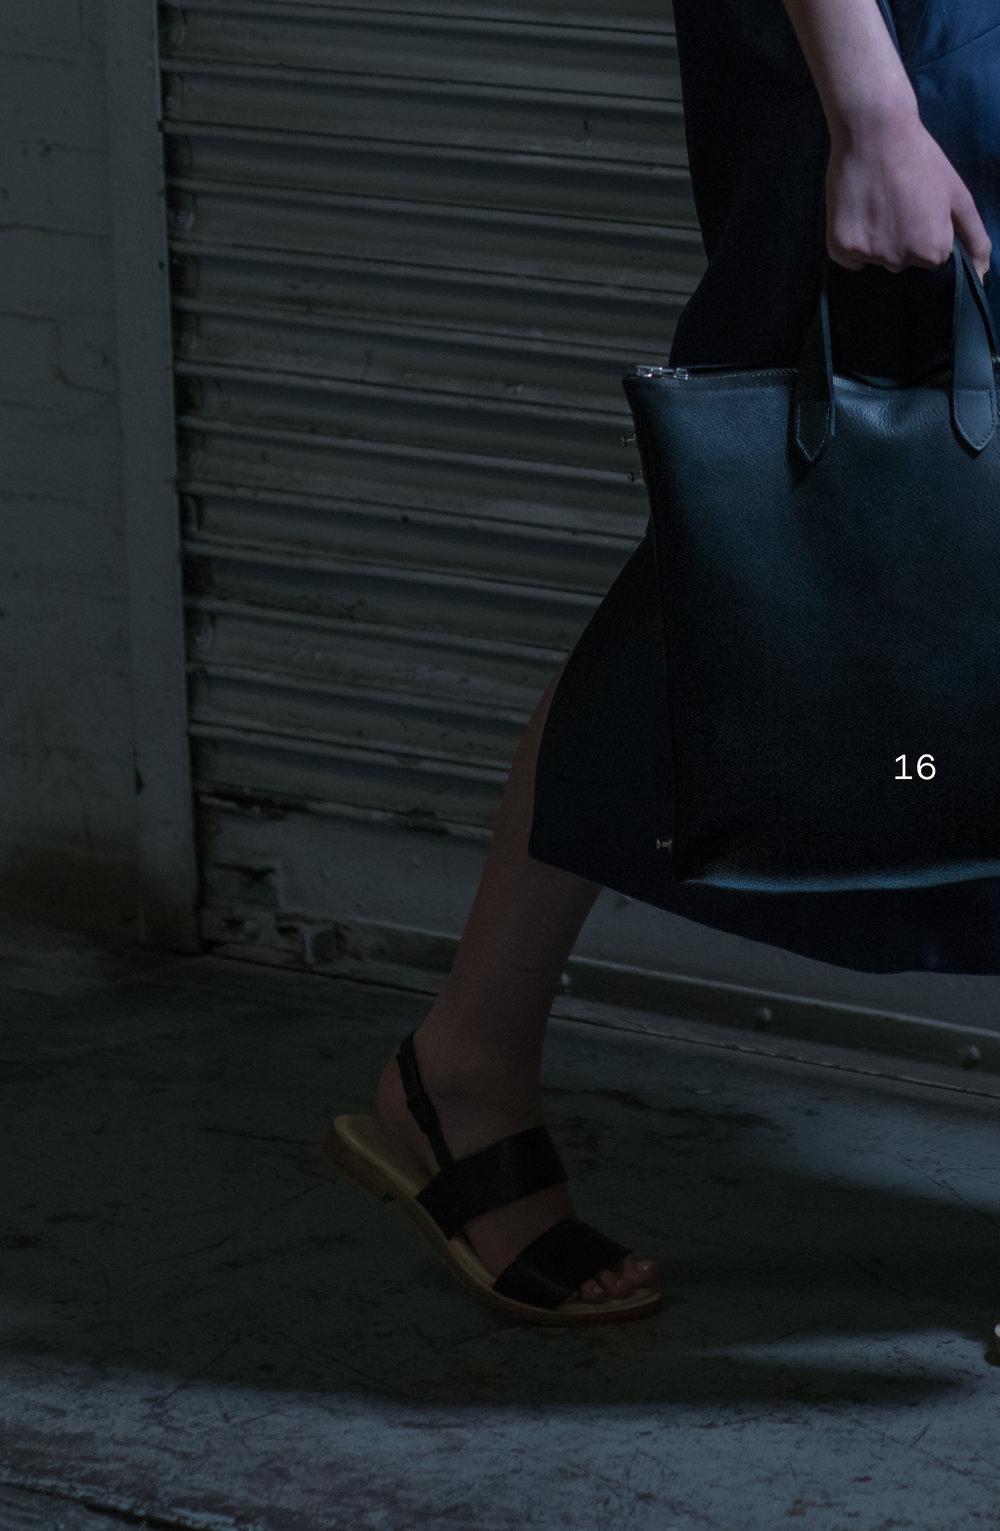 Sonya Lee - Nico bag 05/10